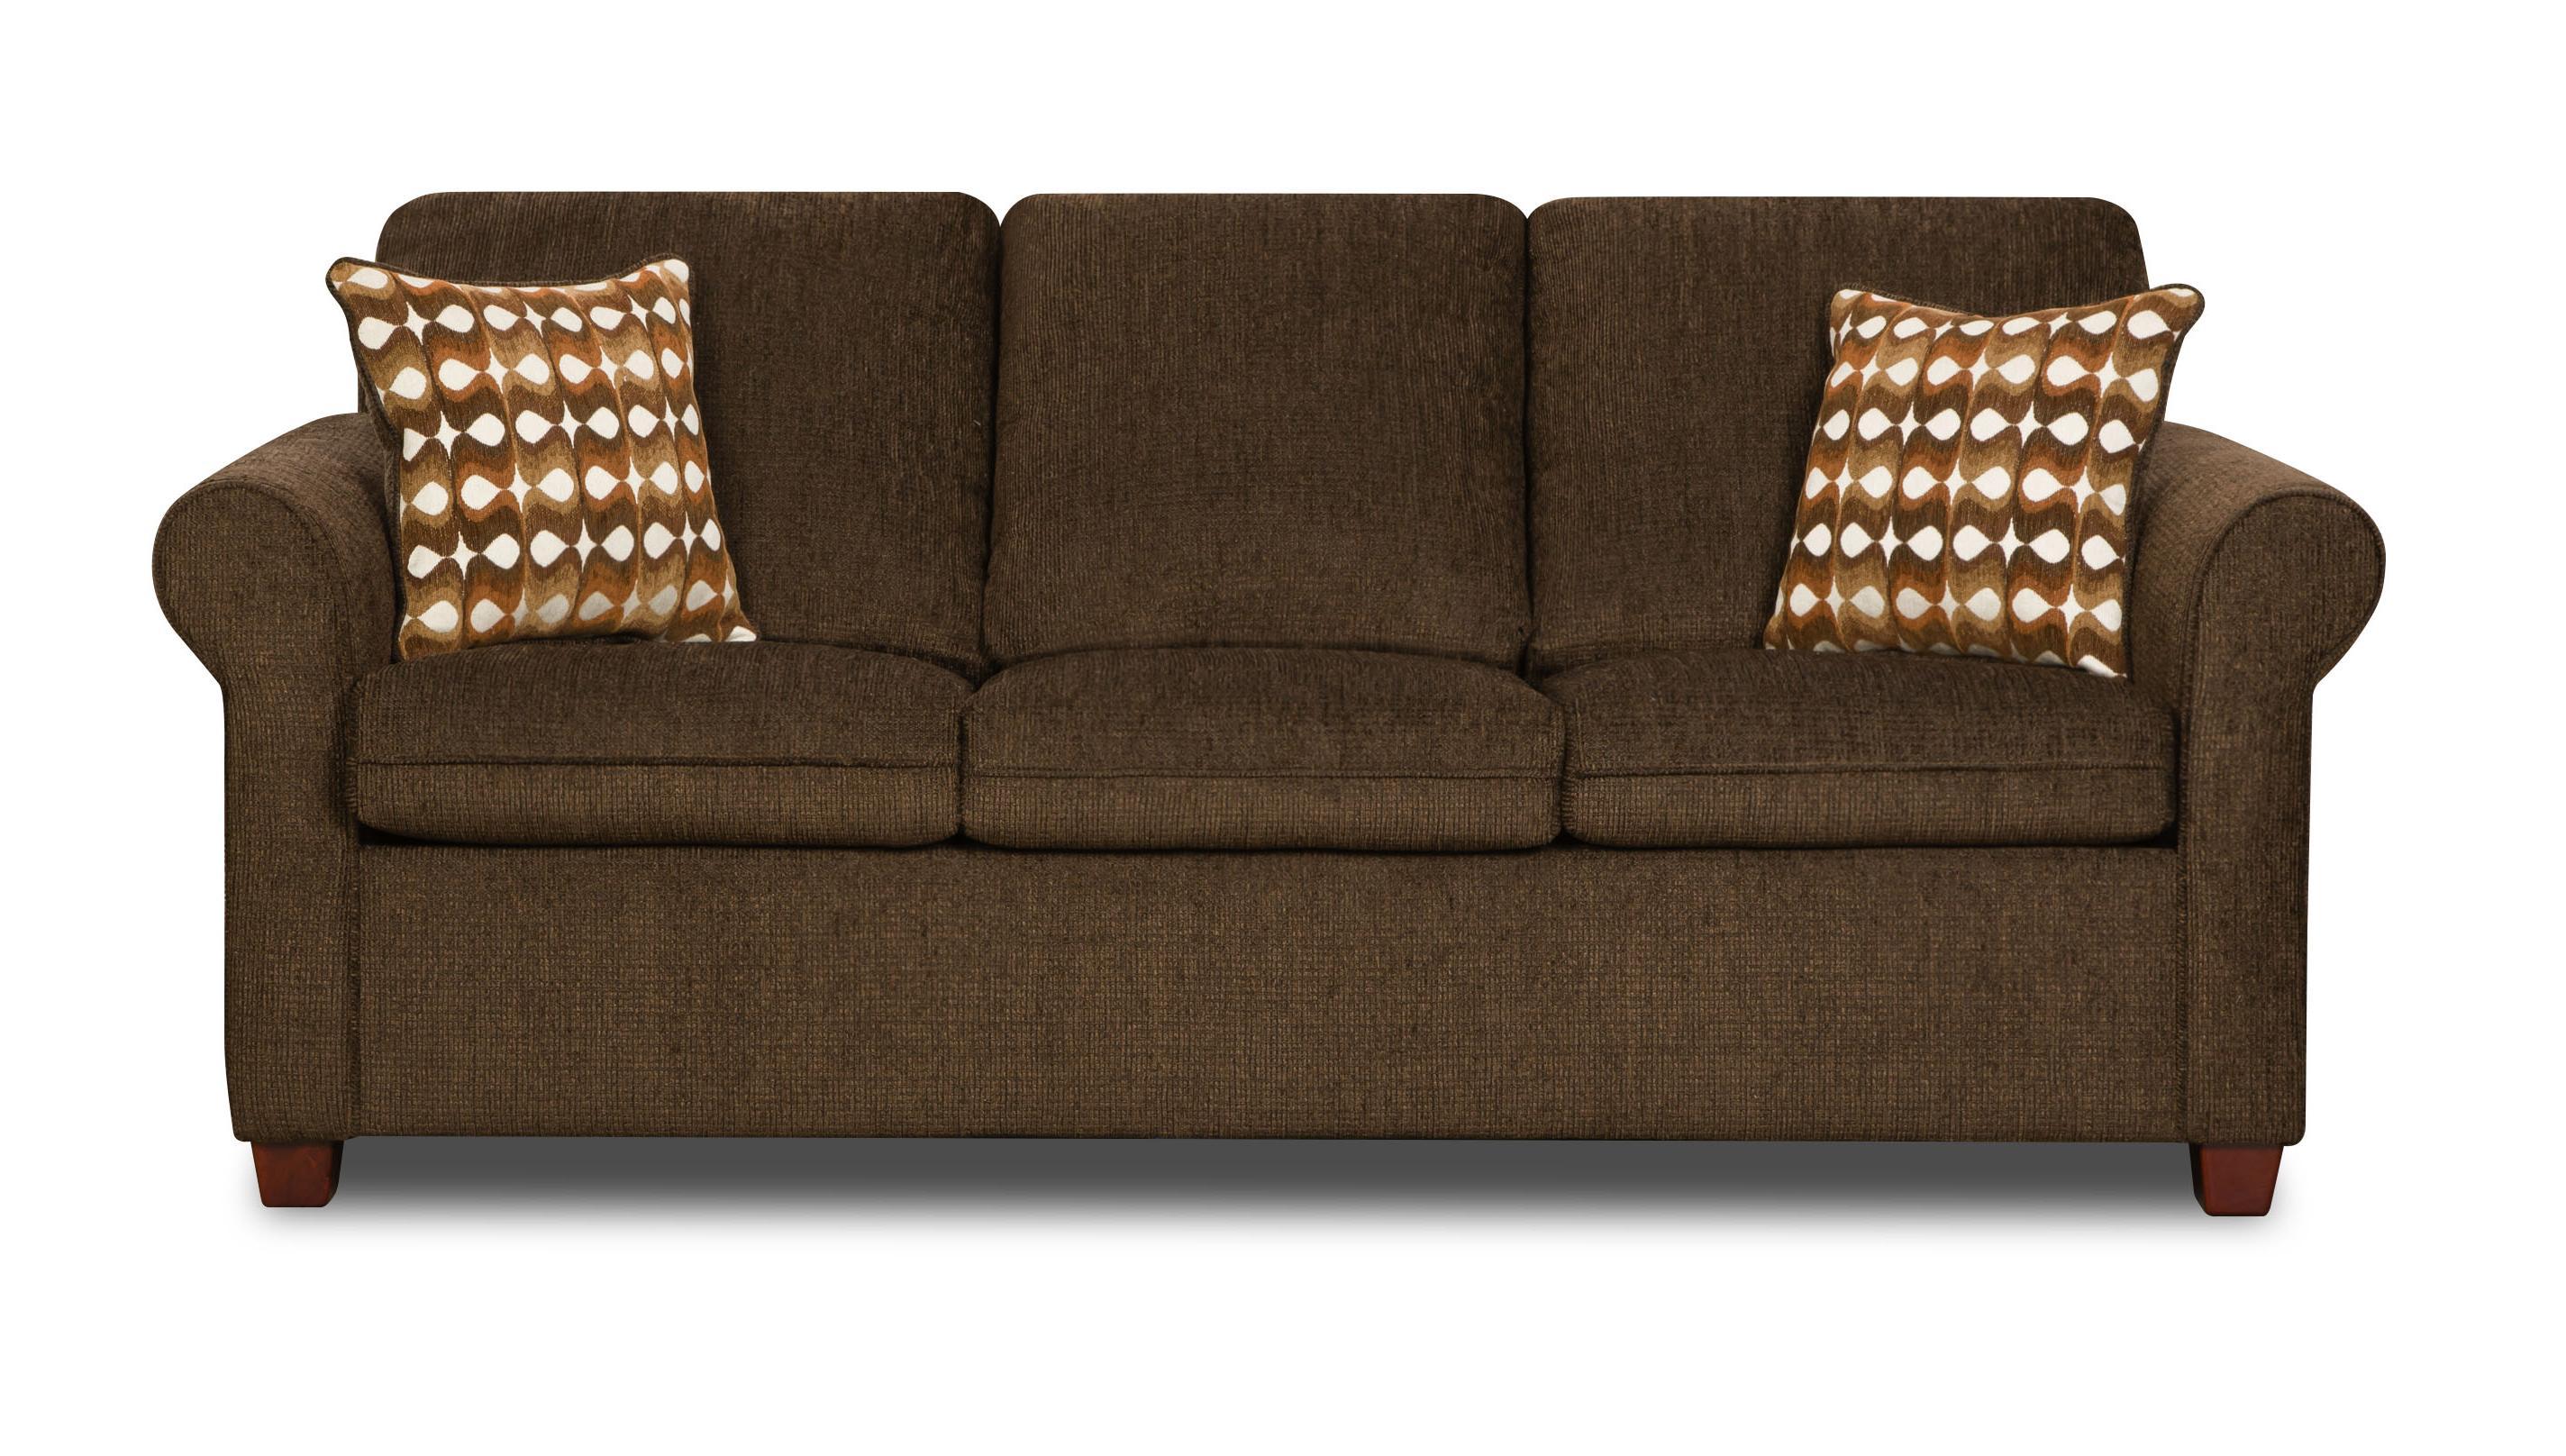 United Furniture Industries 1630 Transitional Queen Sleeper - Item Number: 1630QSleeper-Nutmeg